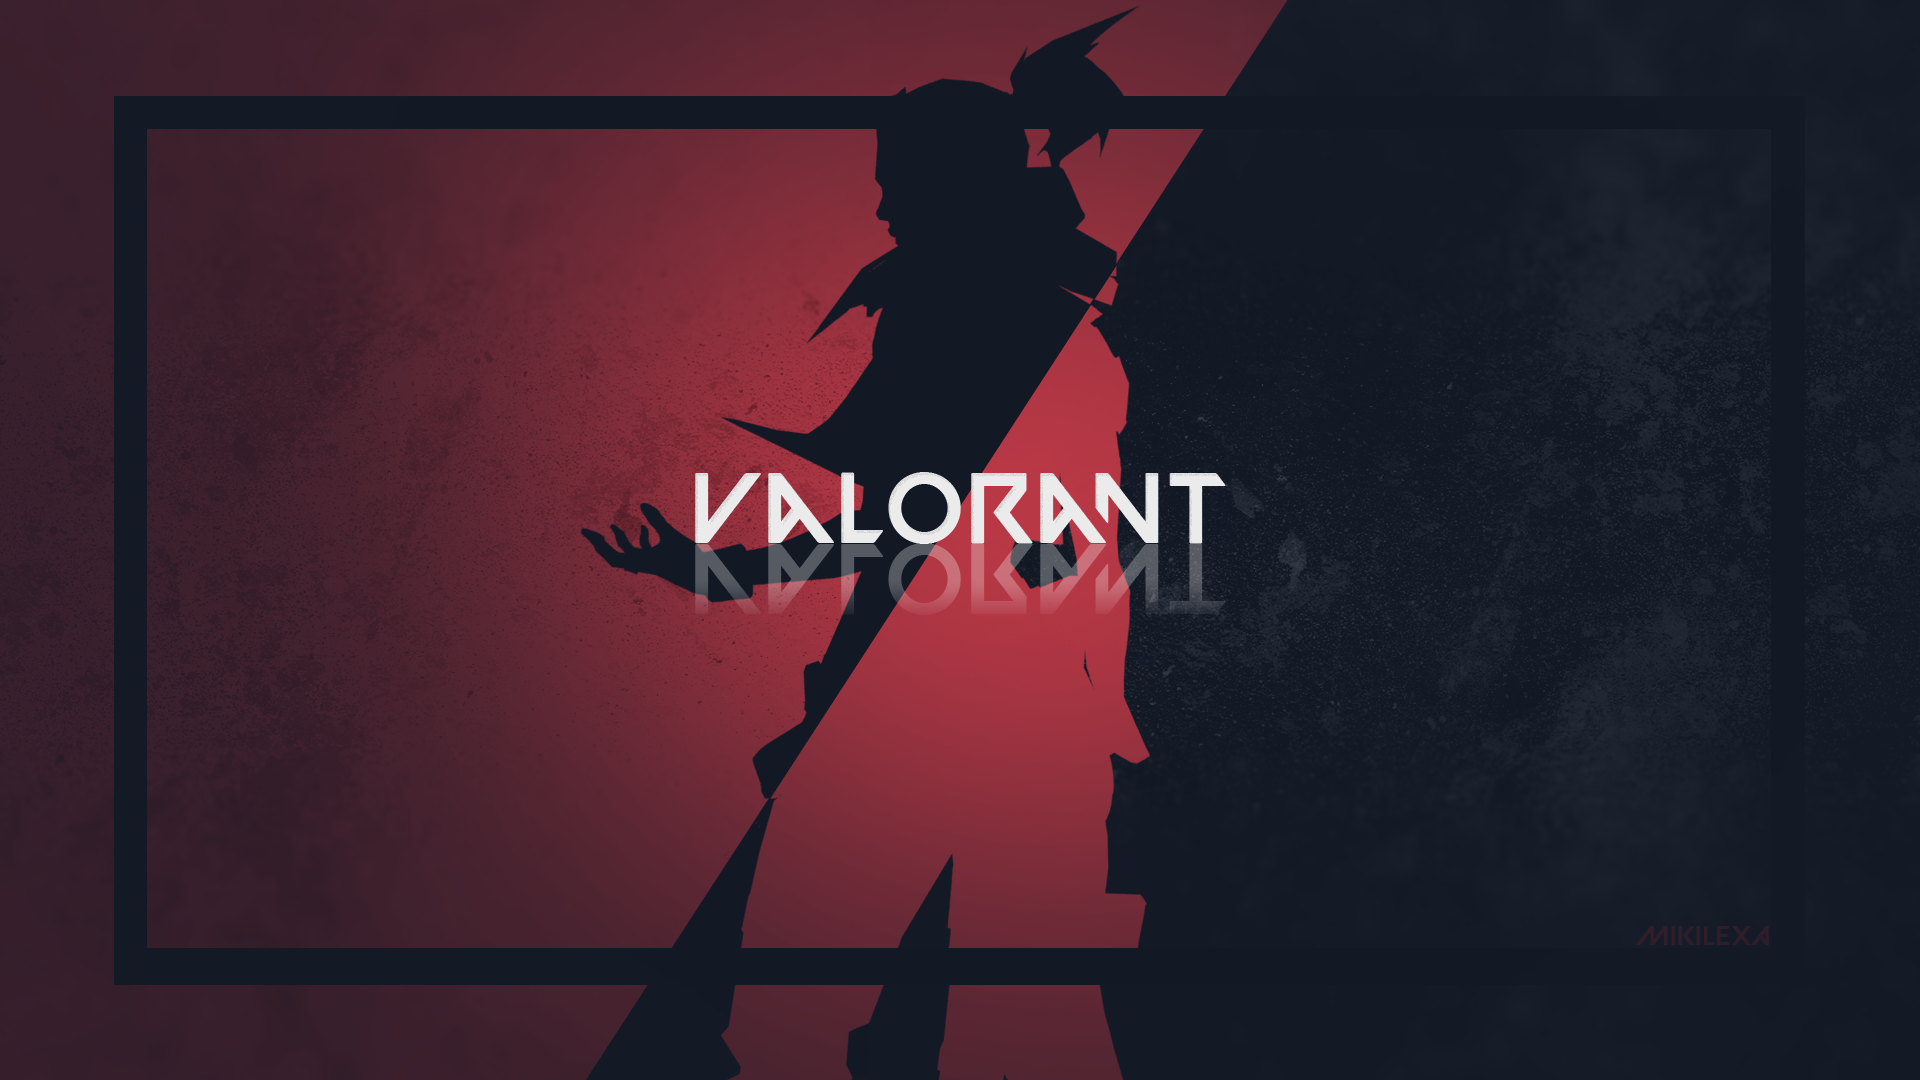 valorant desktop wallpaper 74481